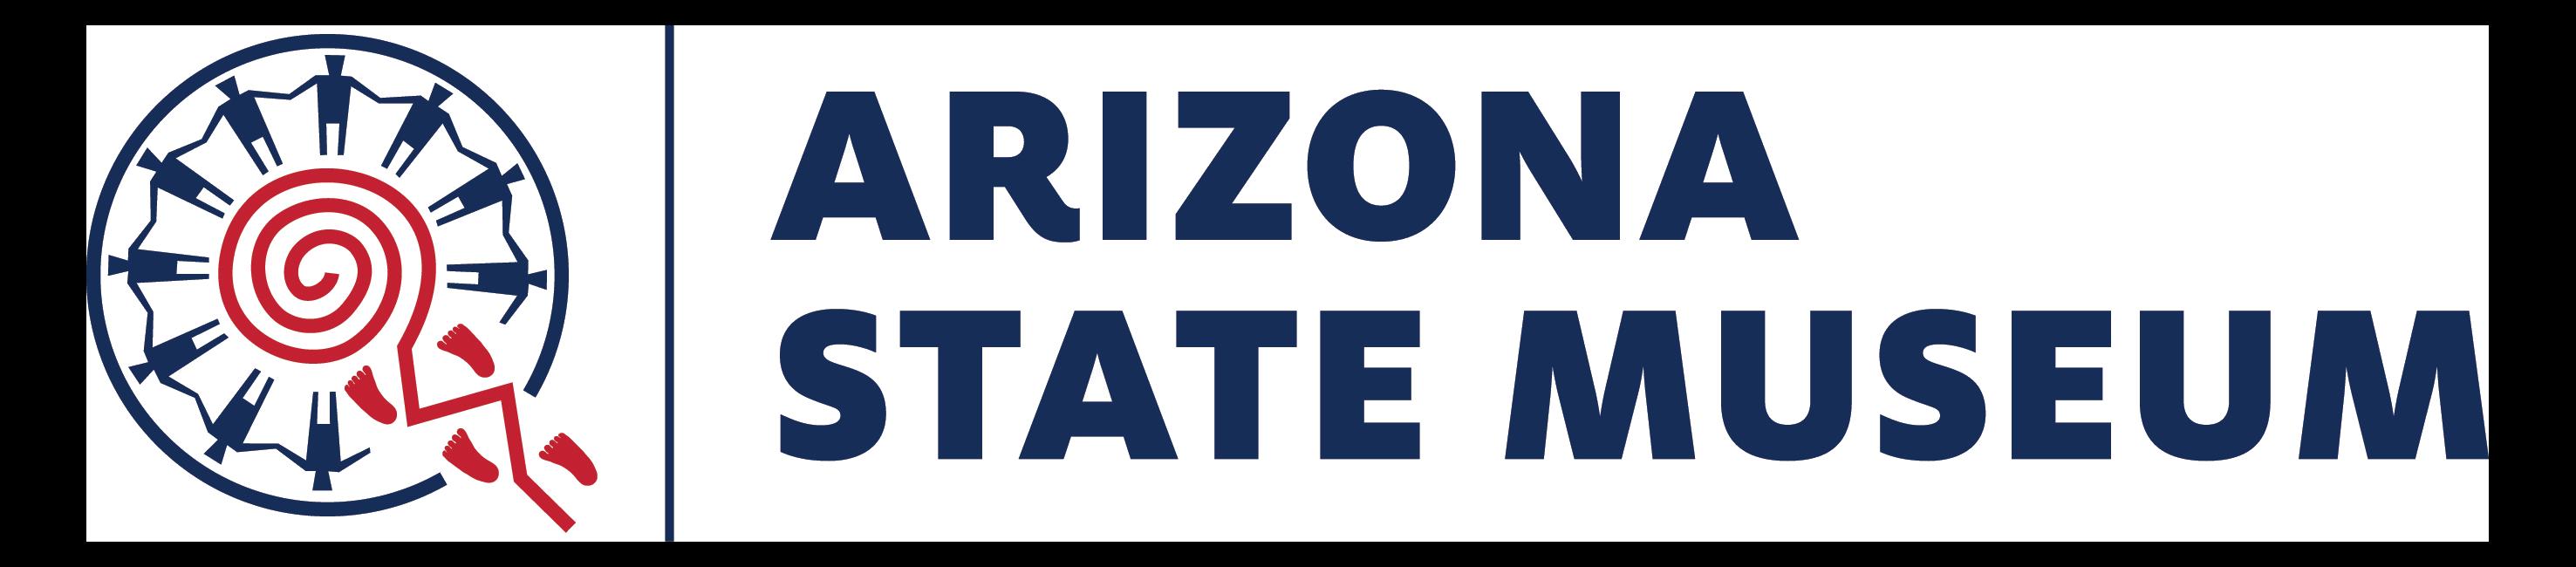 Arizona State Museum | Home